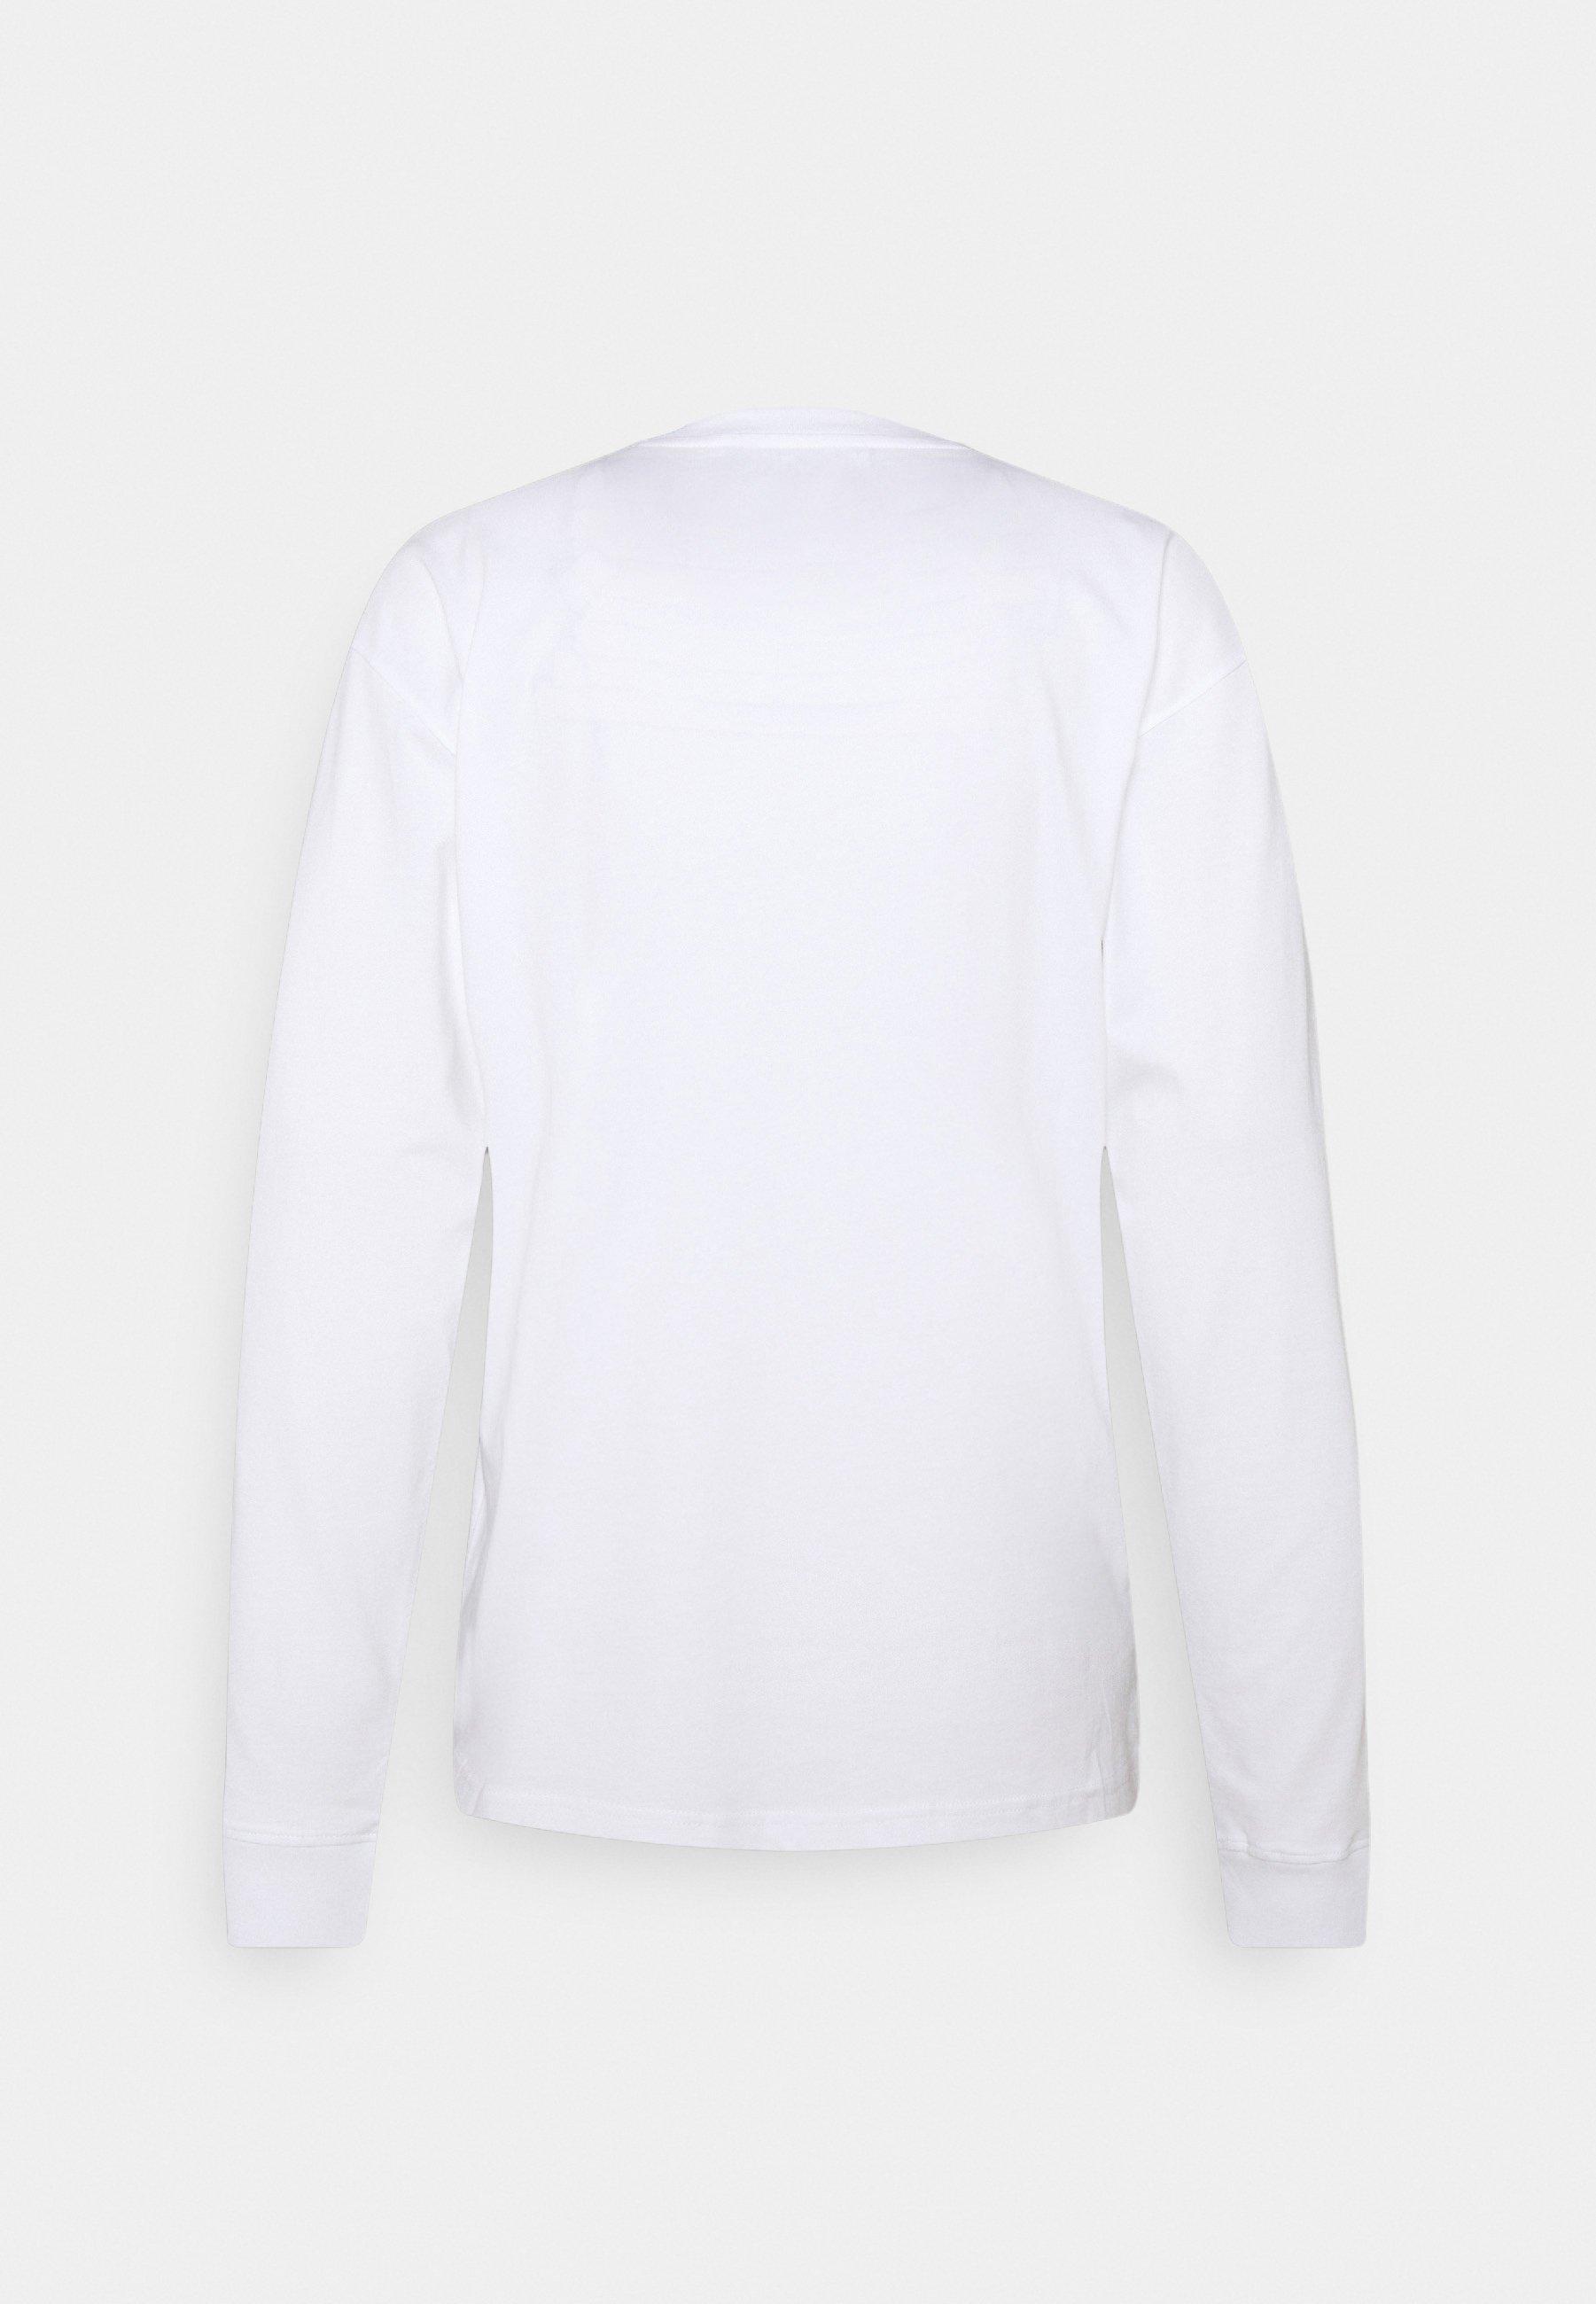 Uomo UPPER BODY GARMENT - Maglietta a manica lunga